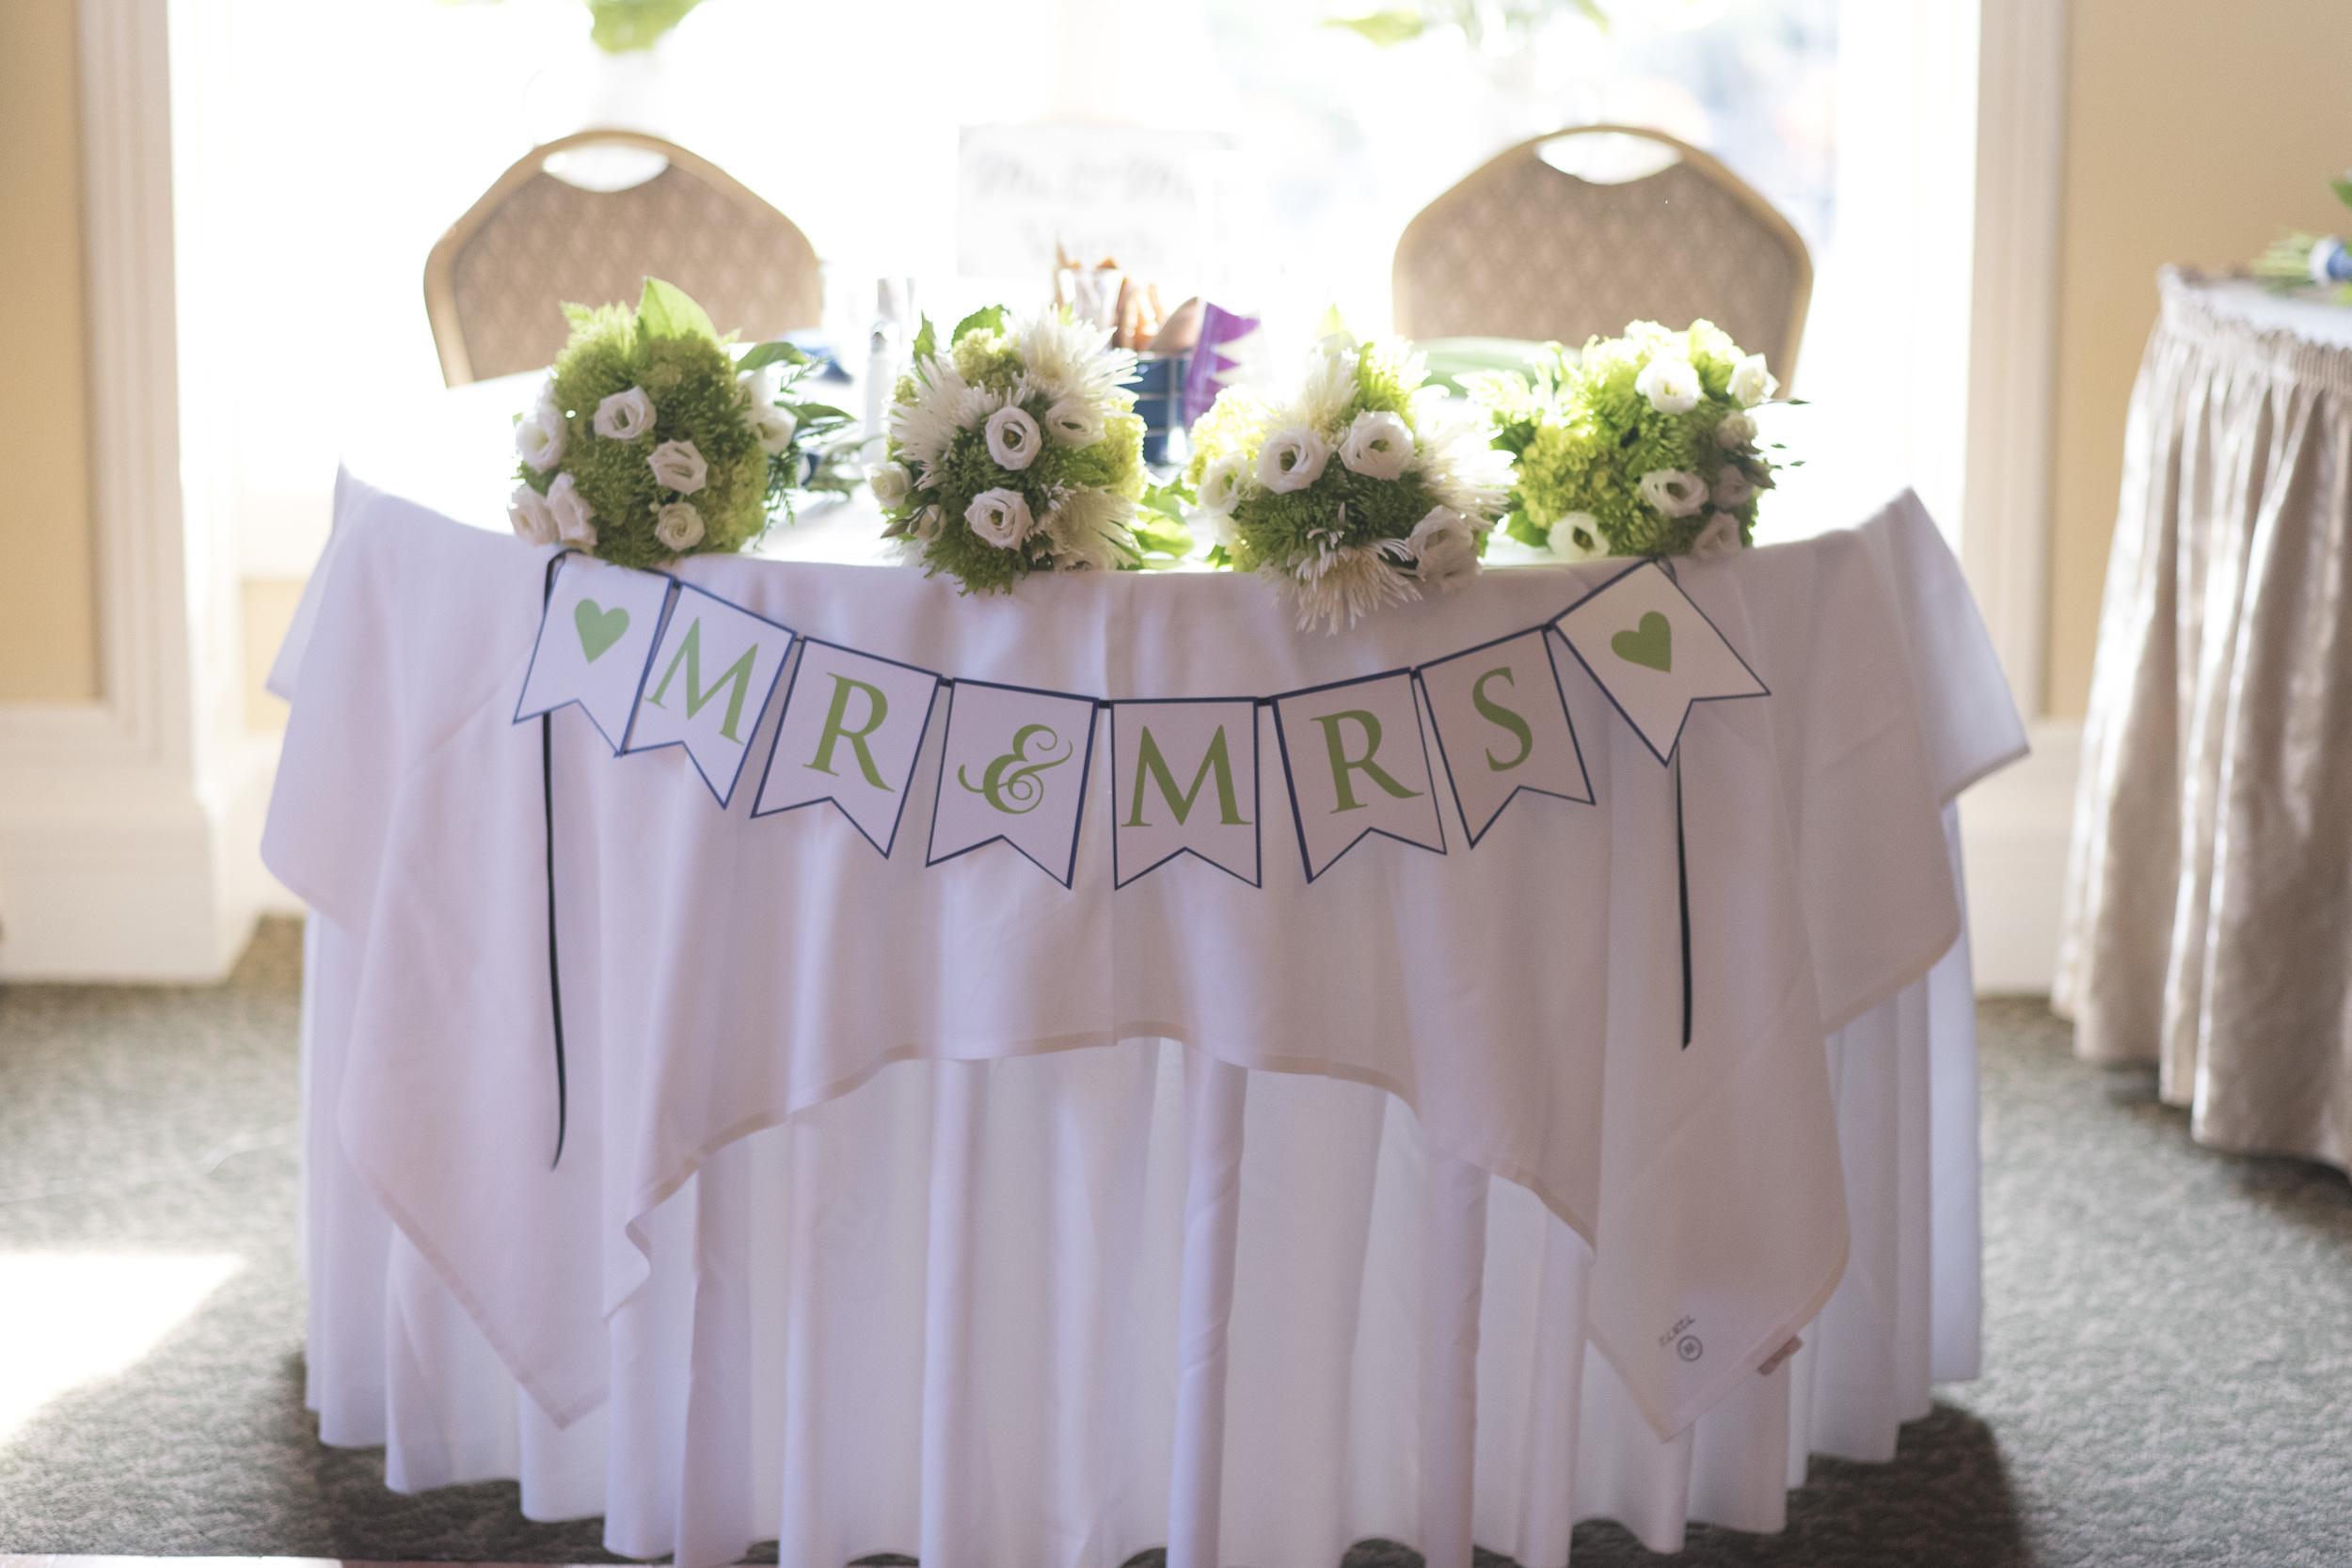 New_jersey_blue_heron_pines_wedding20150529_0585.jpg